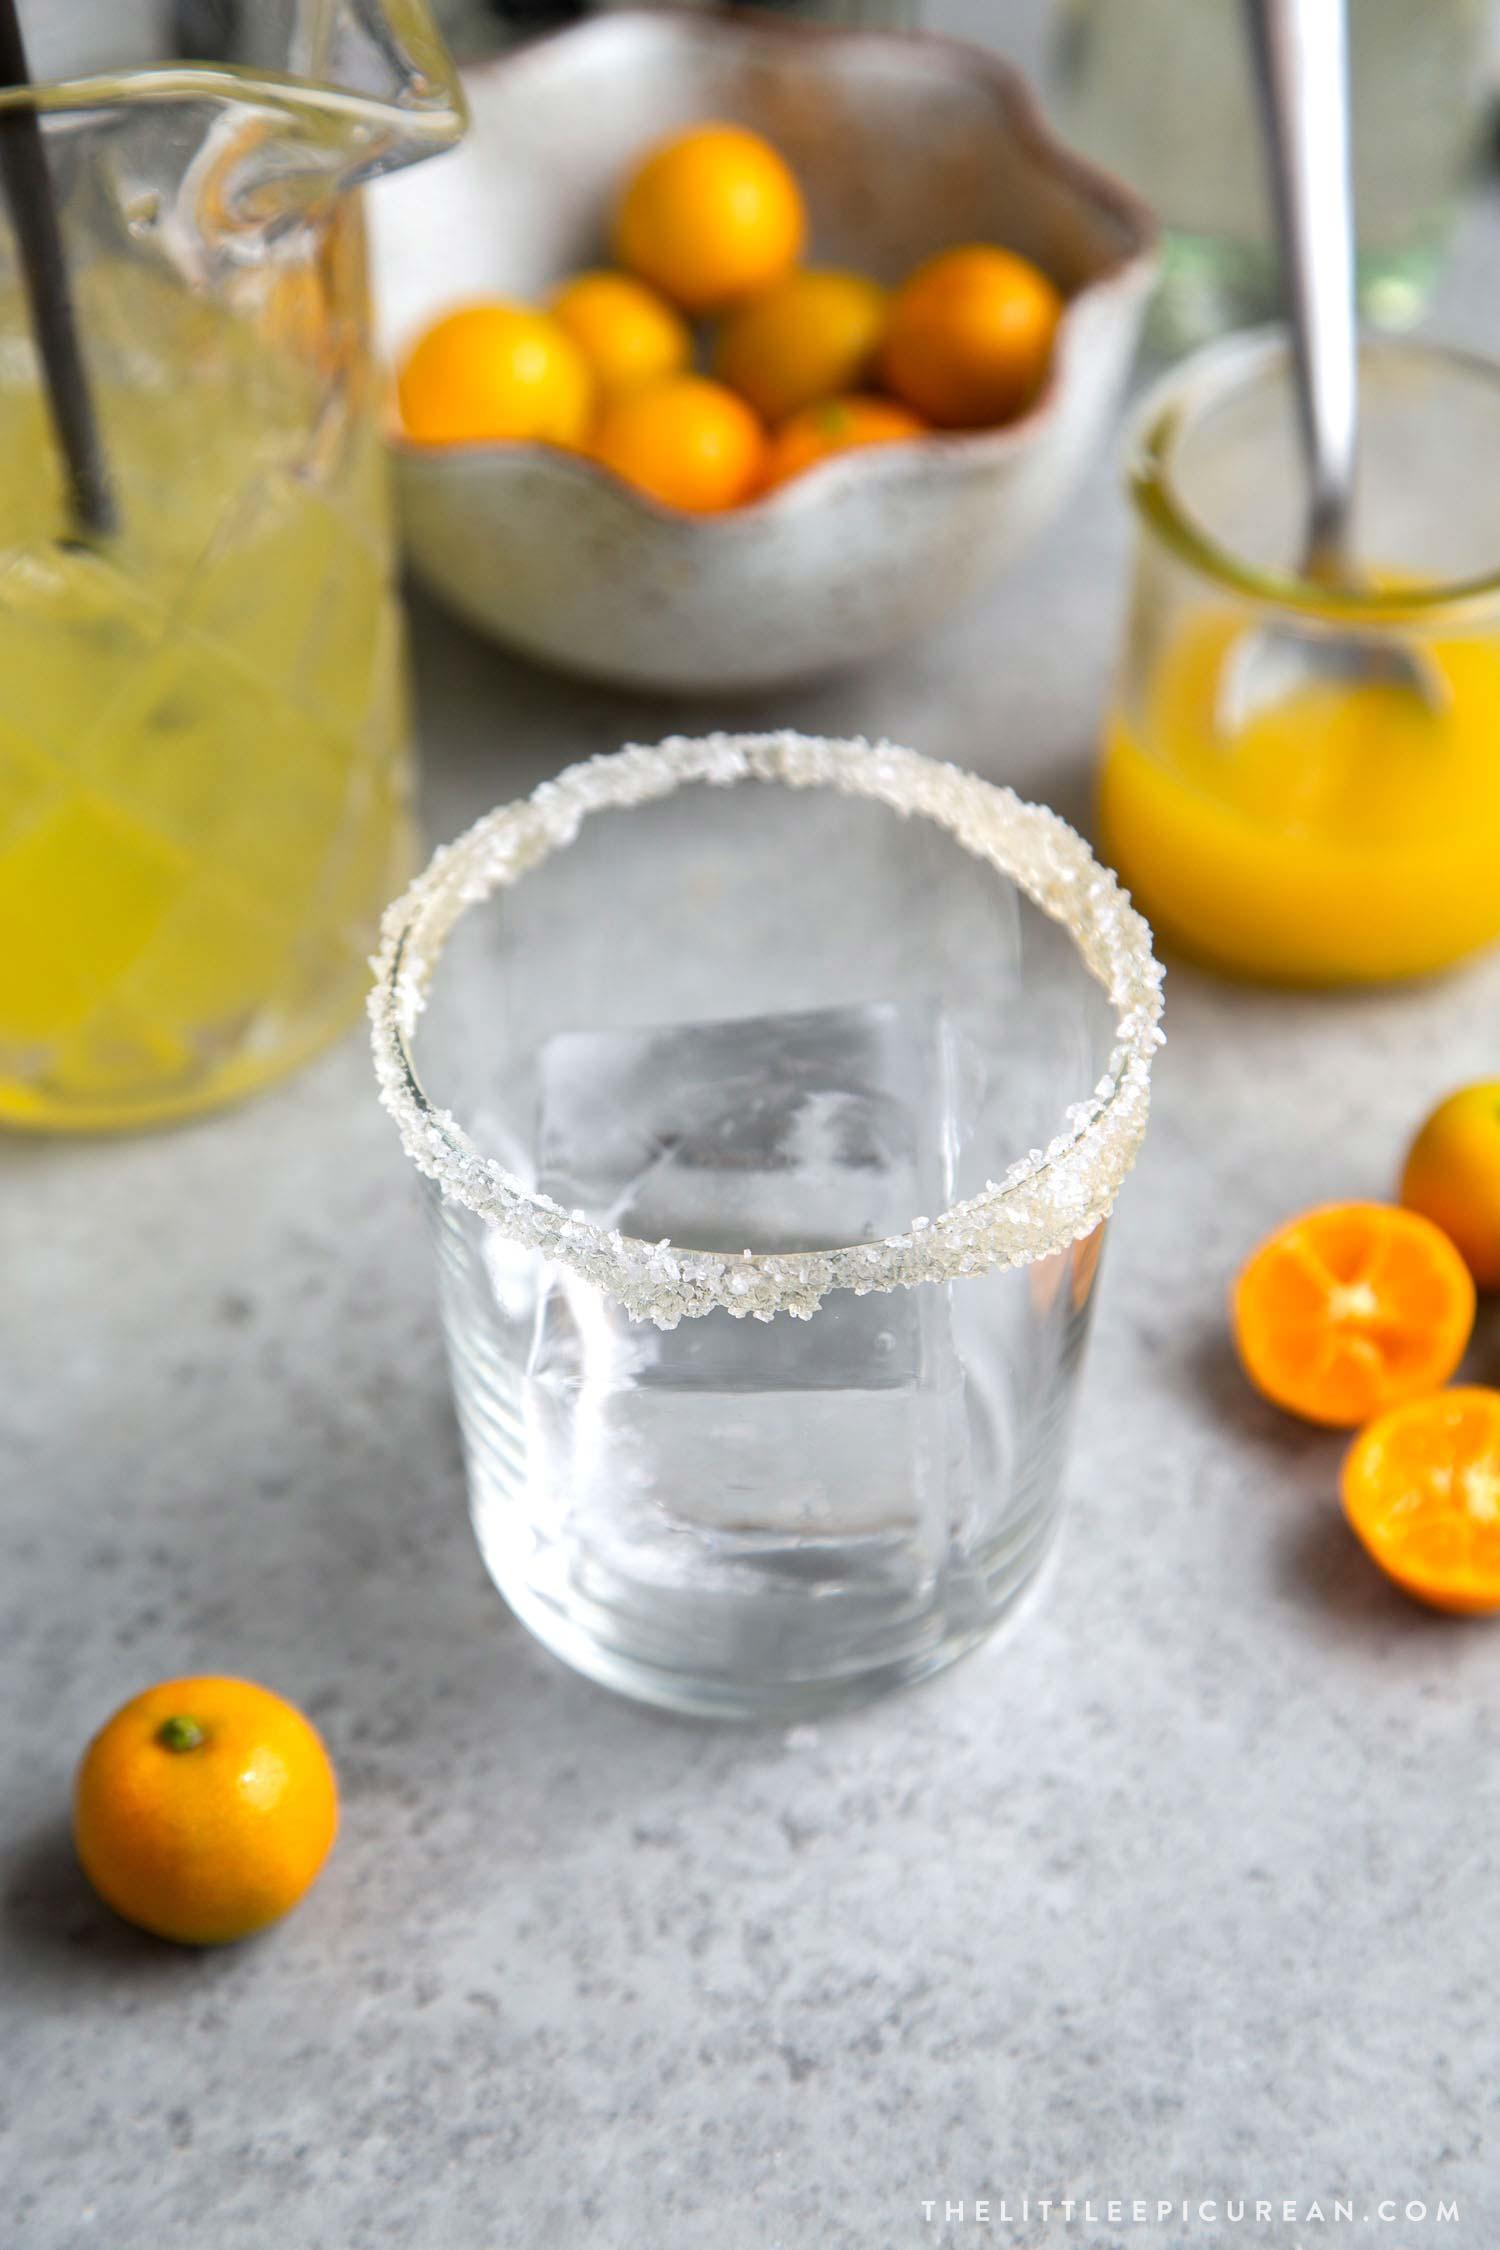 Calamansi Margarita with honey-salt rimmed glass